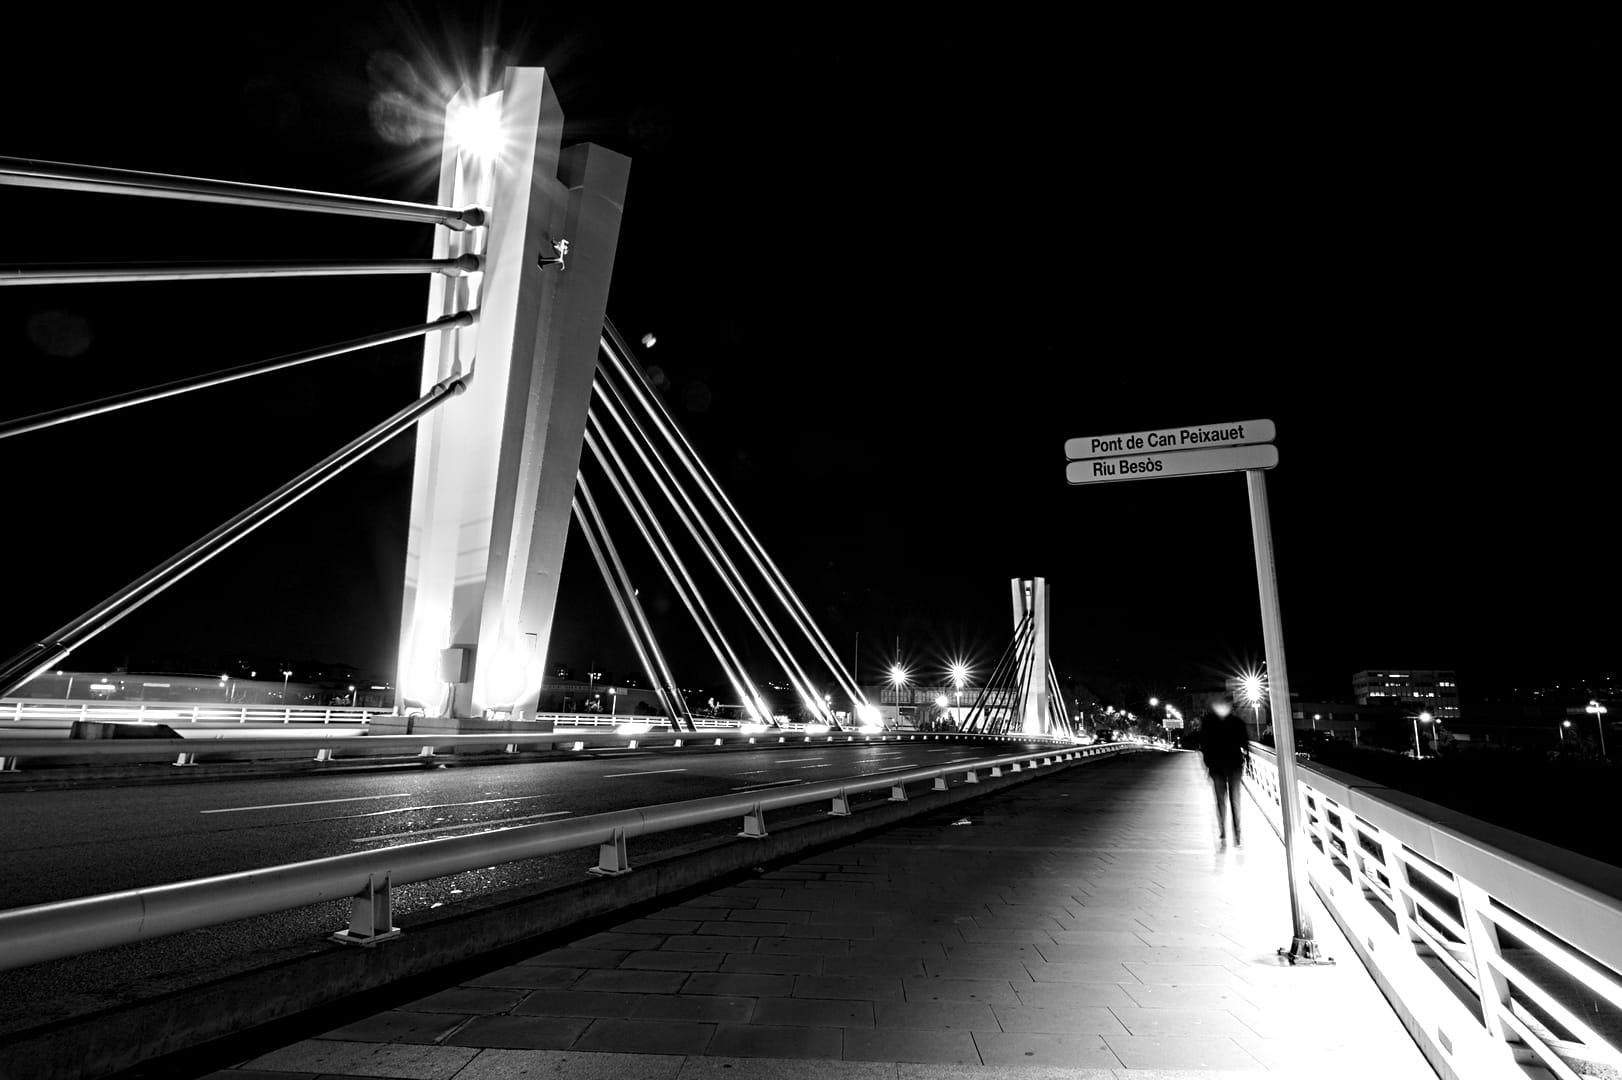 Pont de Can Peixauet